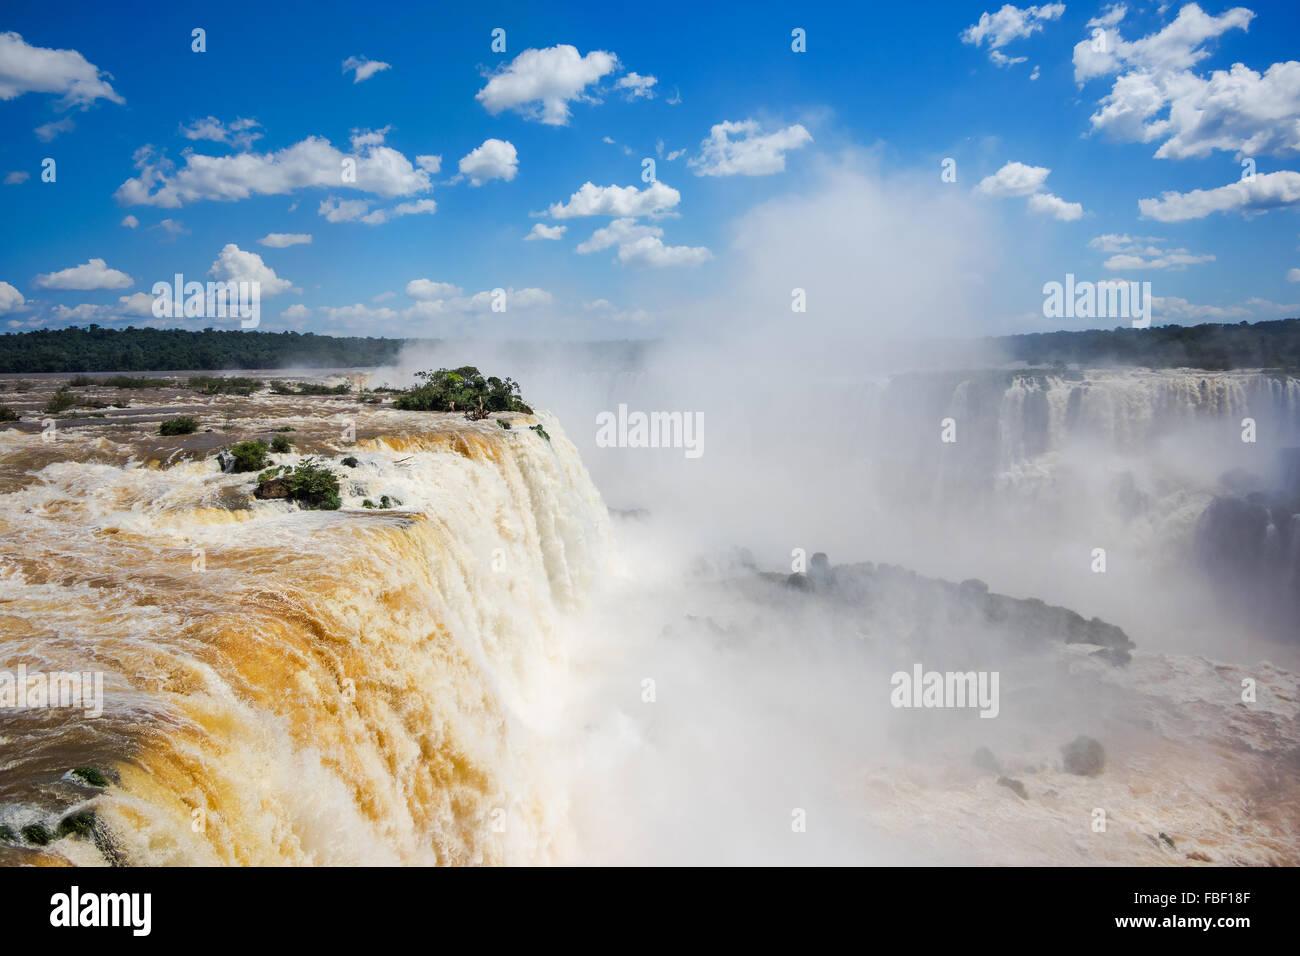 Iguassu Falls, sul confine di Argentina e Brasile. Immagini Stock